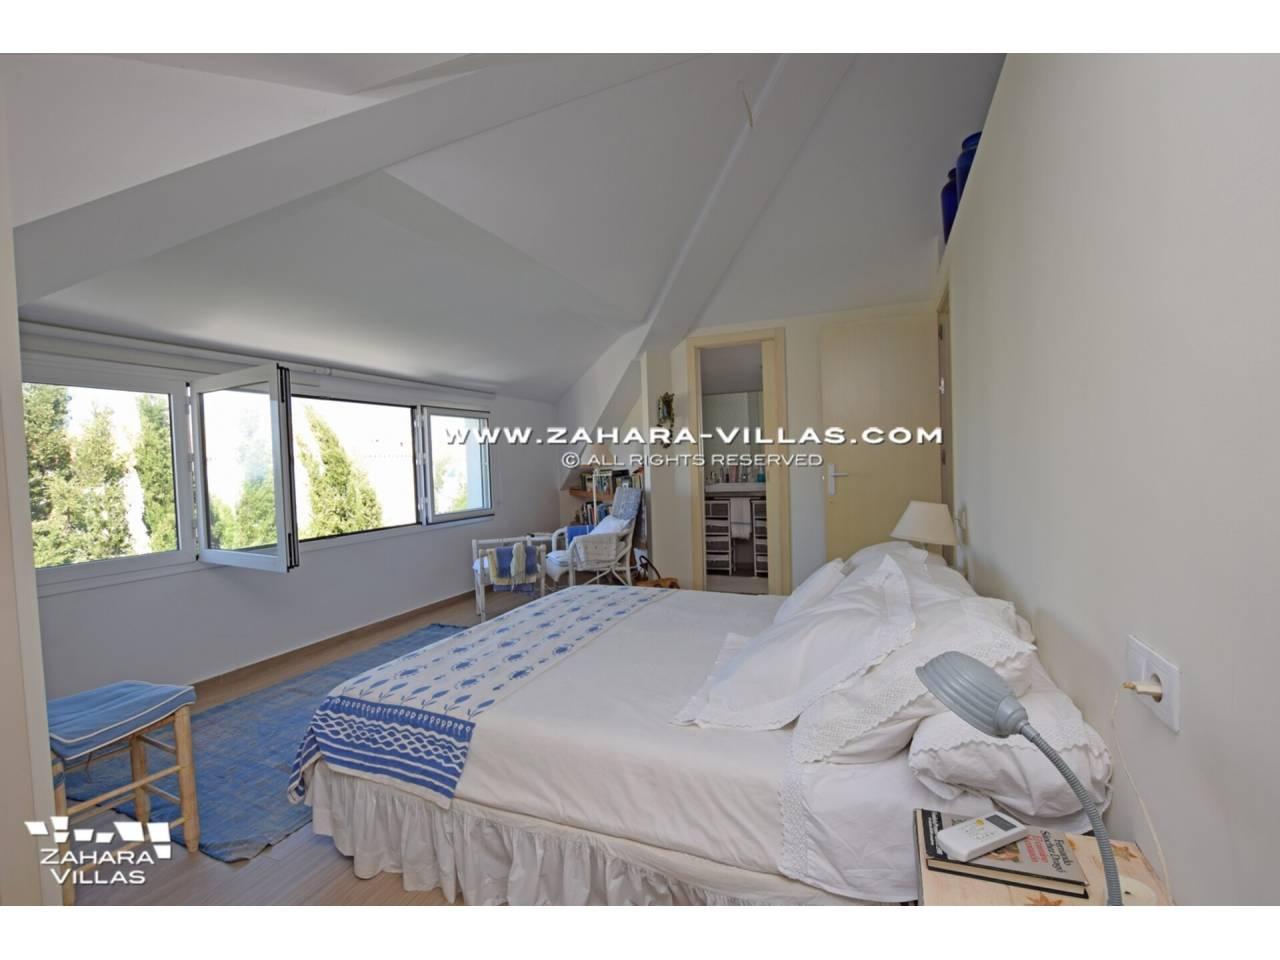 Imagen 37 de House for sale close to the beach, with sea views in Zahara de los Atunes